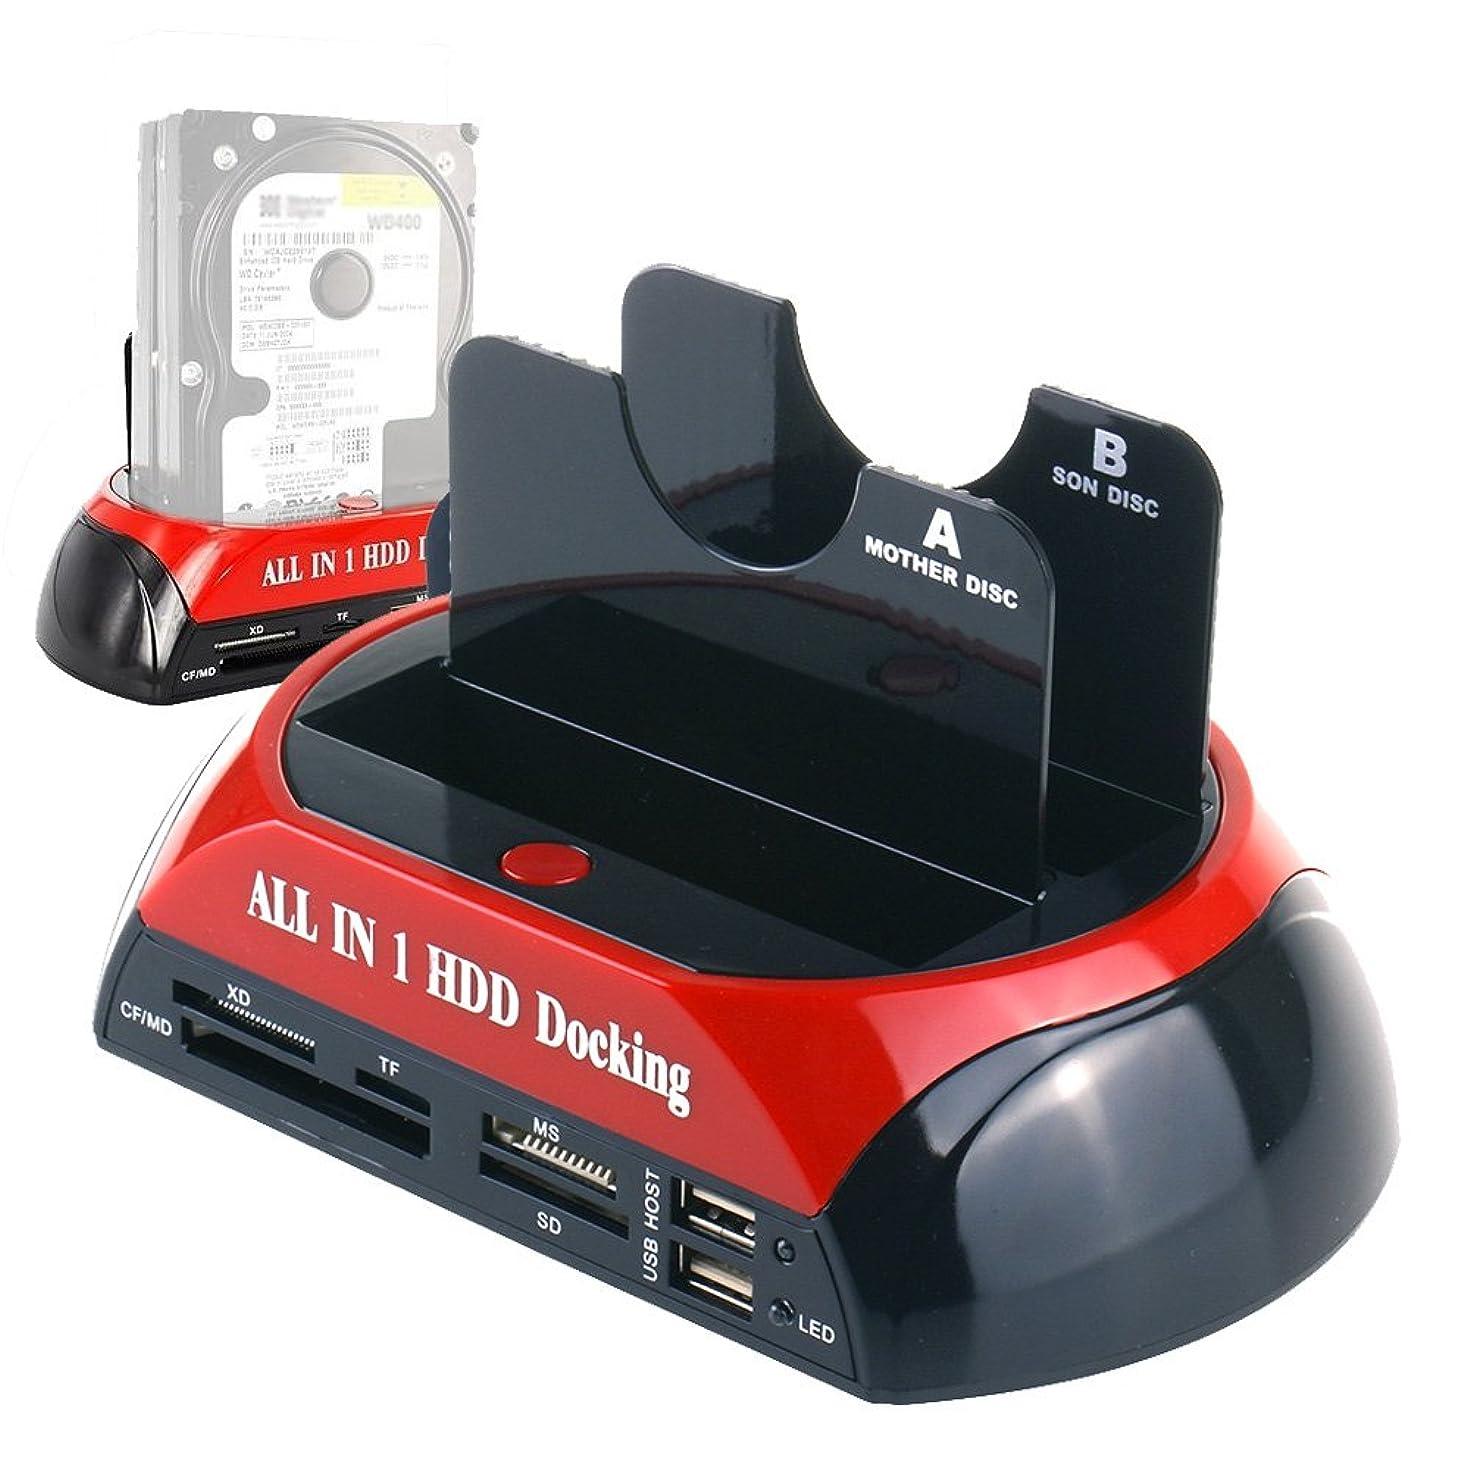 WANLONGXIN WLX-876U3SC USB 3.0 to SATA Dual Bay External Hard Drive Docking Station with Offline Clone Function and Card Reader USB Hub, for 2.5 3.5 Inch HDD SSD SATA I/II/III up to 2 x 8TB